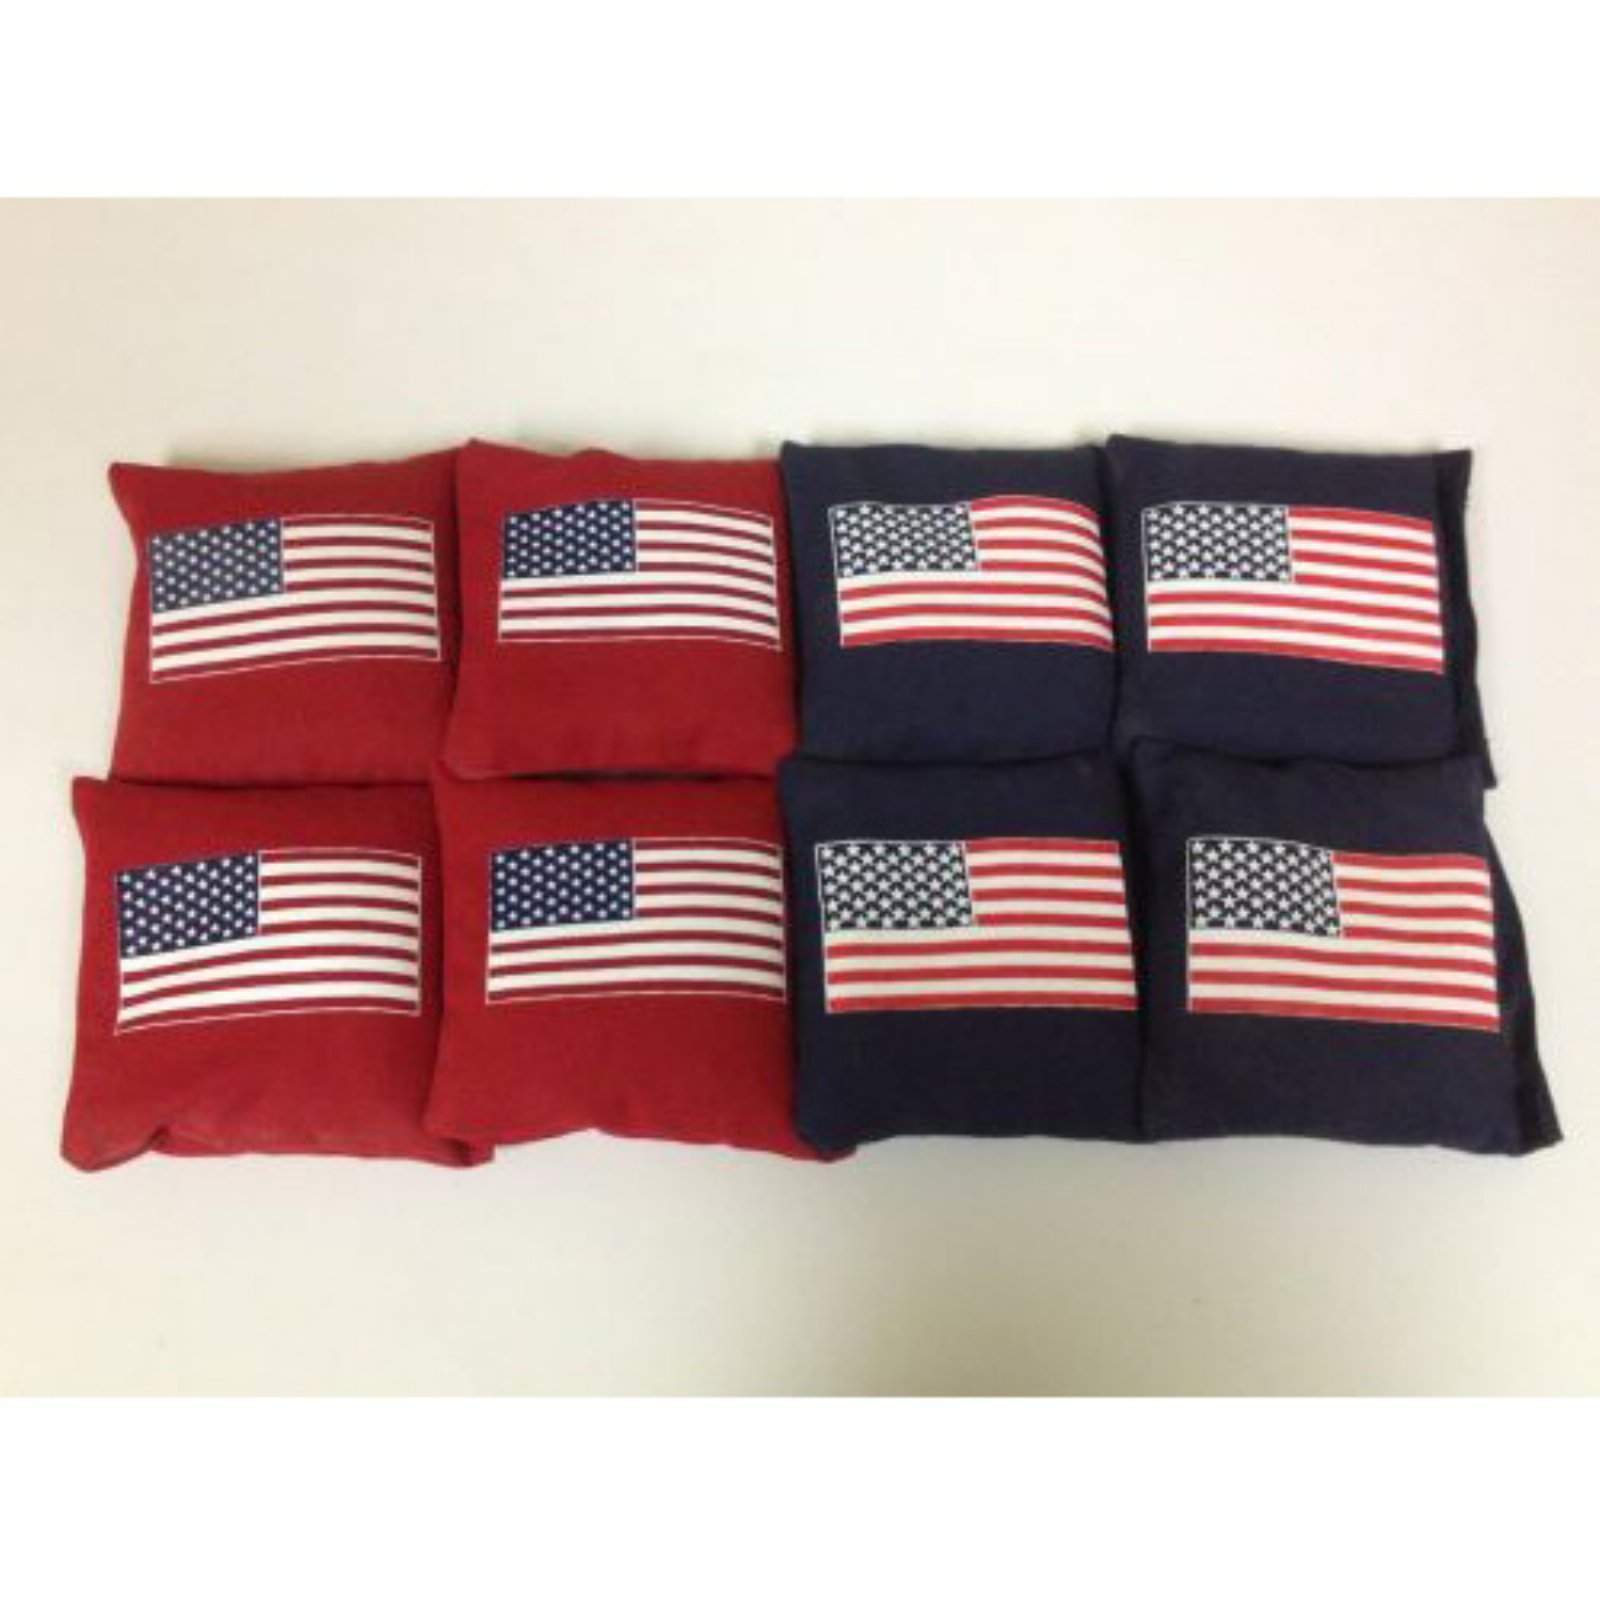 US Flag Cornhole Bags Set of 8 by AJJ Cornhole